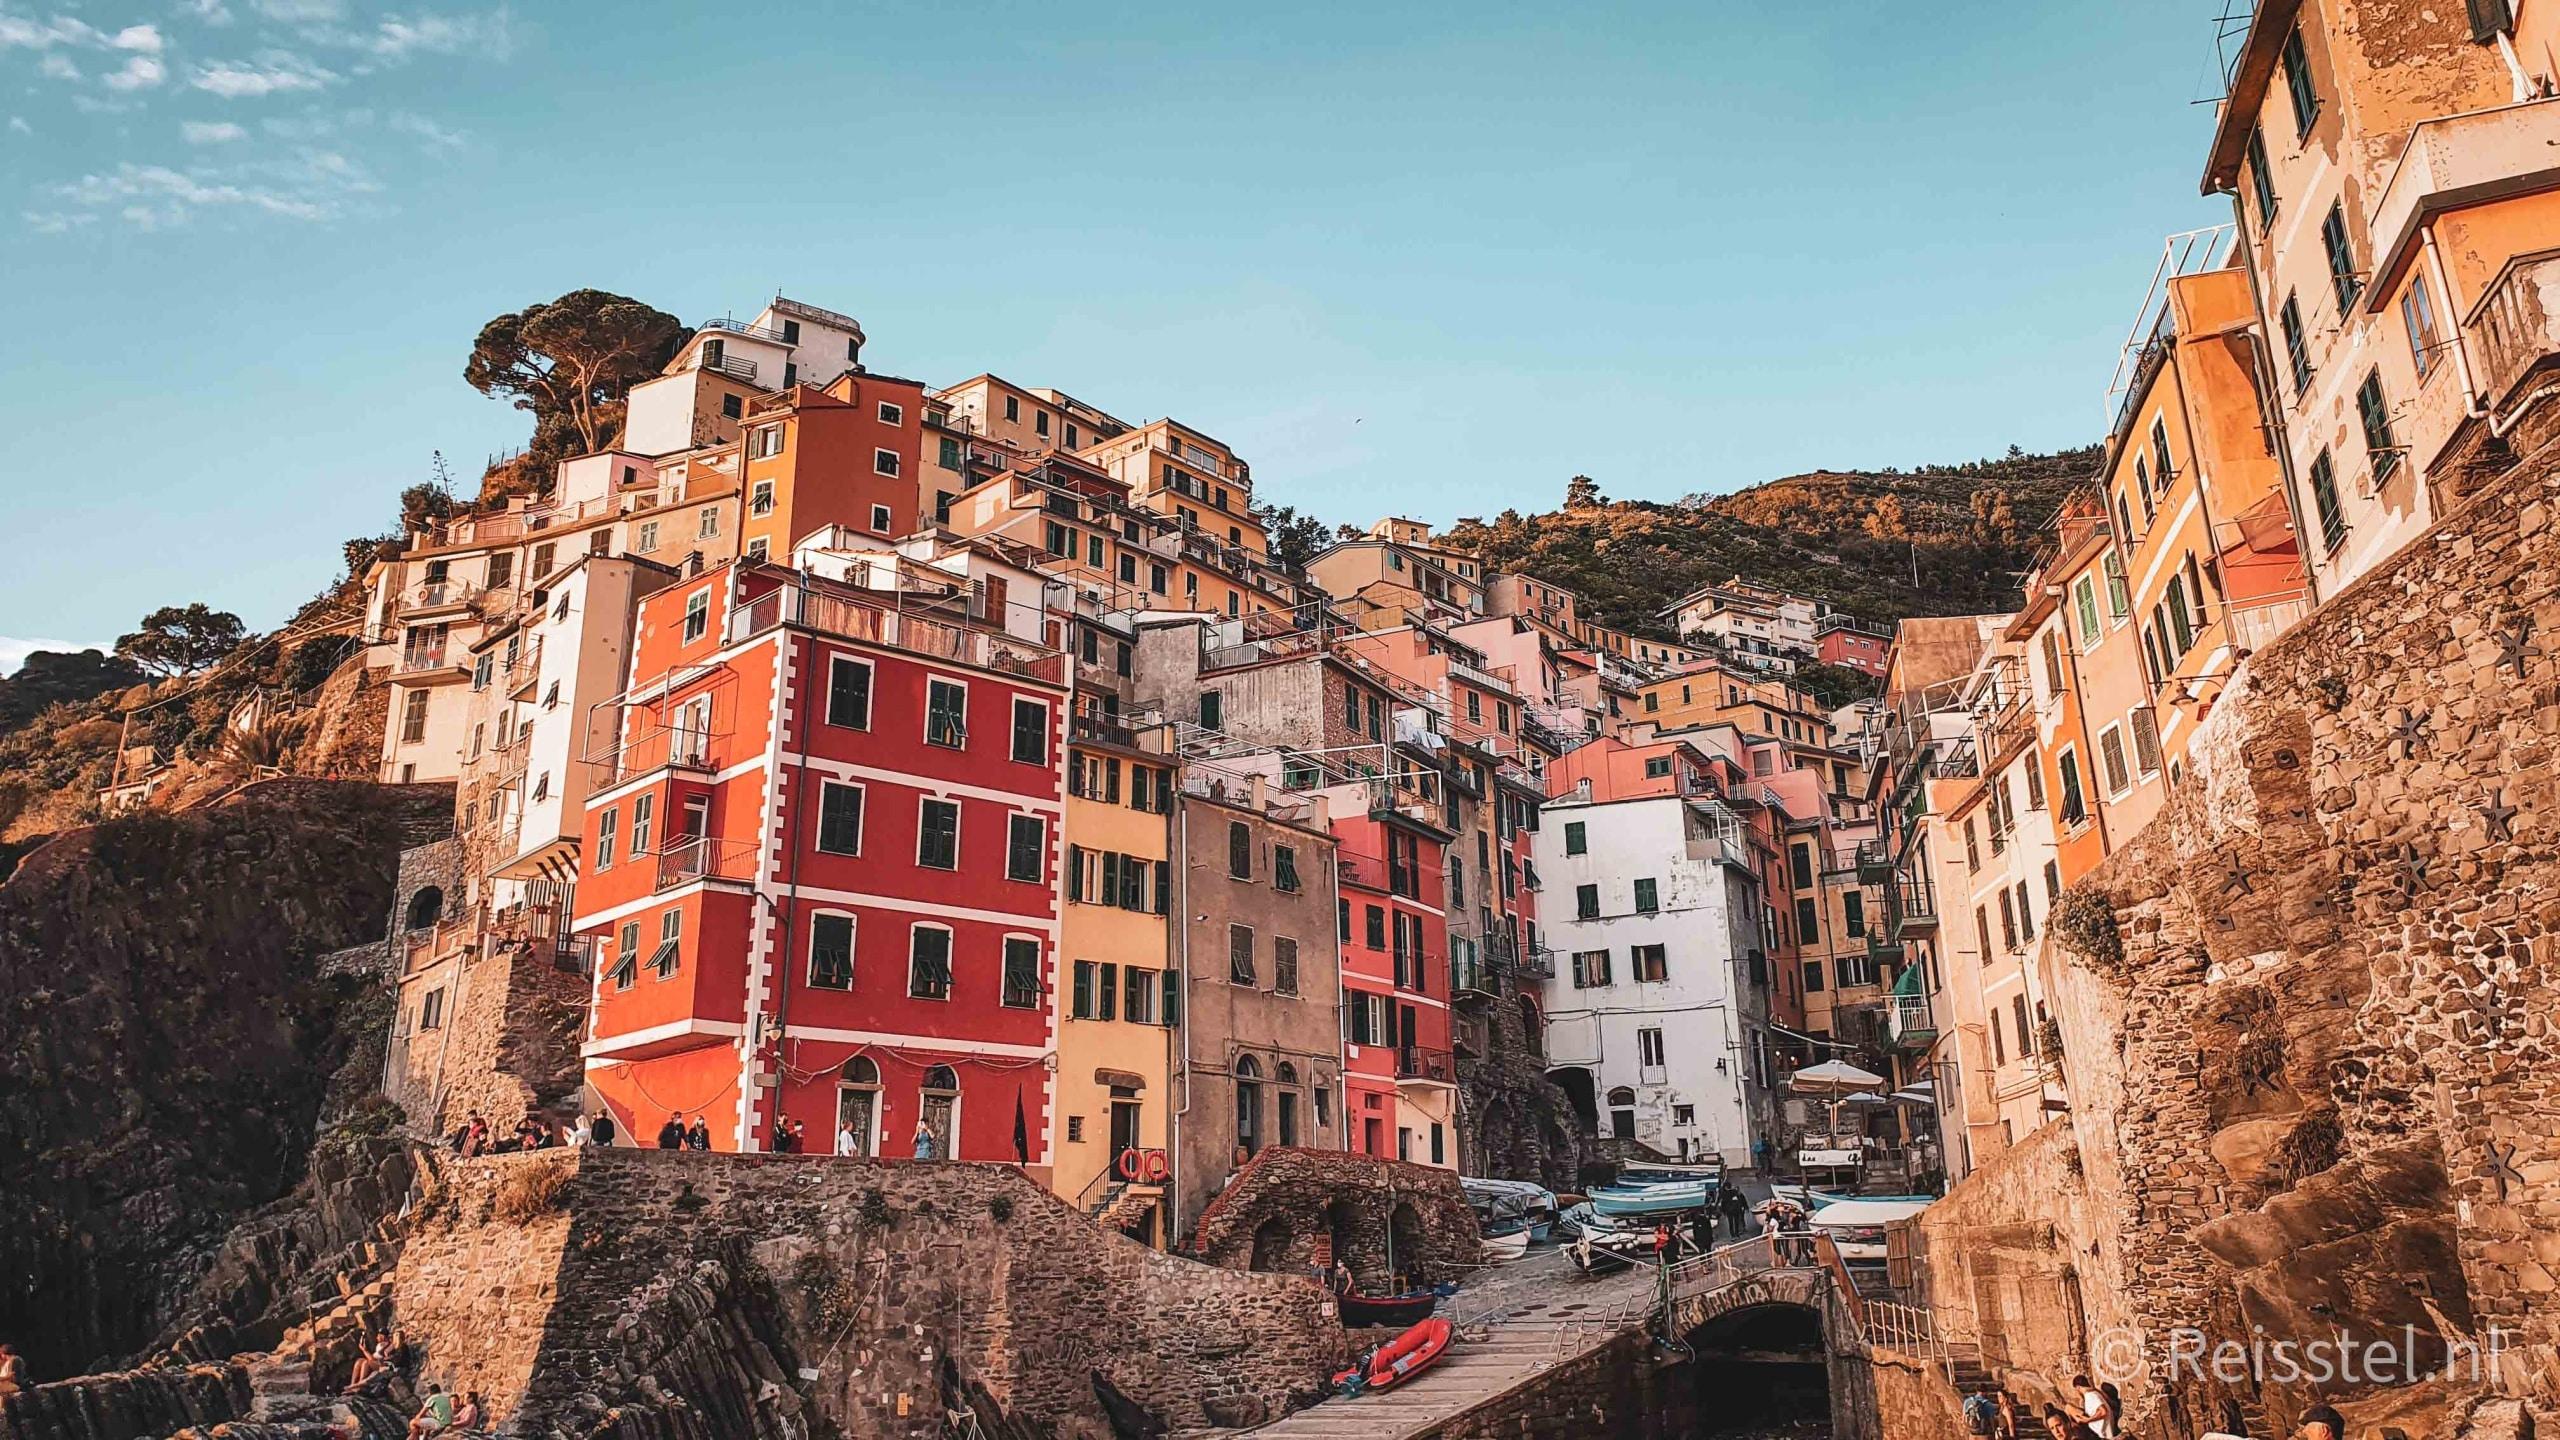 Must do in Italië: de Cinque Terre hike | 2 daagse wandeling | header